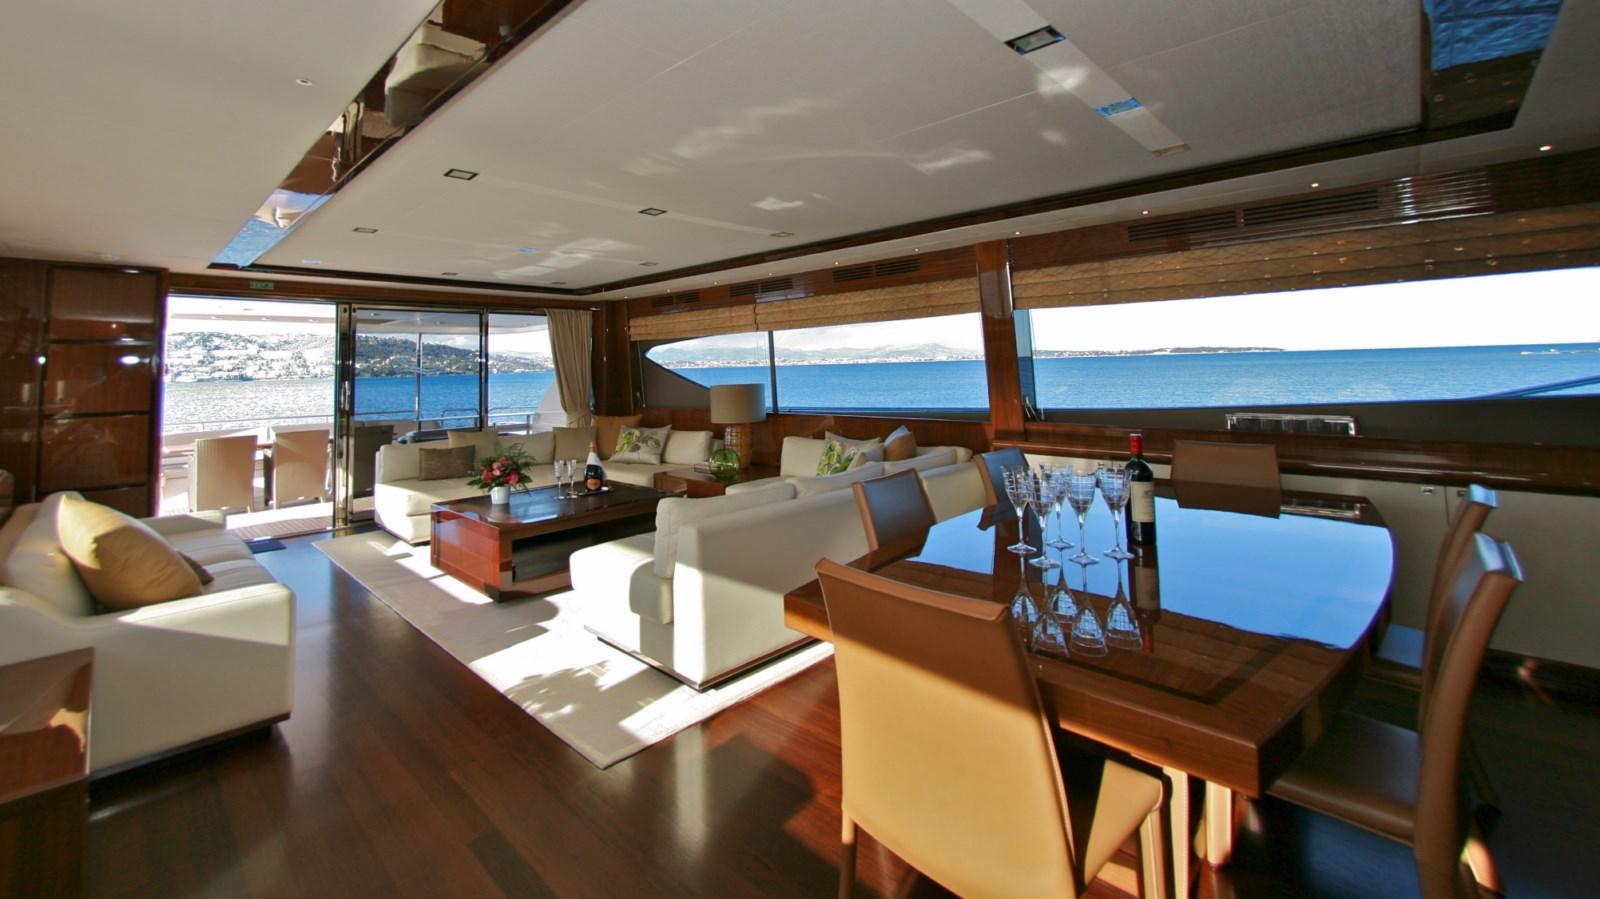 Motor yacht LADY BEATRICE - Main Salon looking Aft